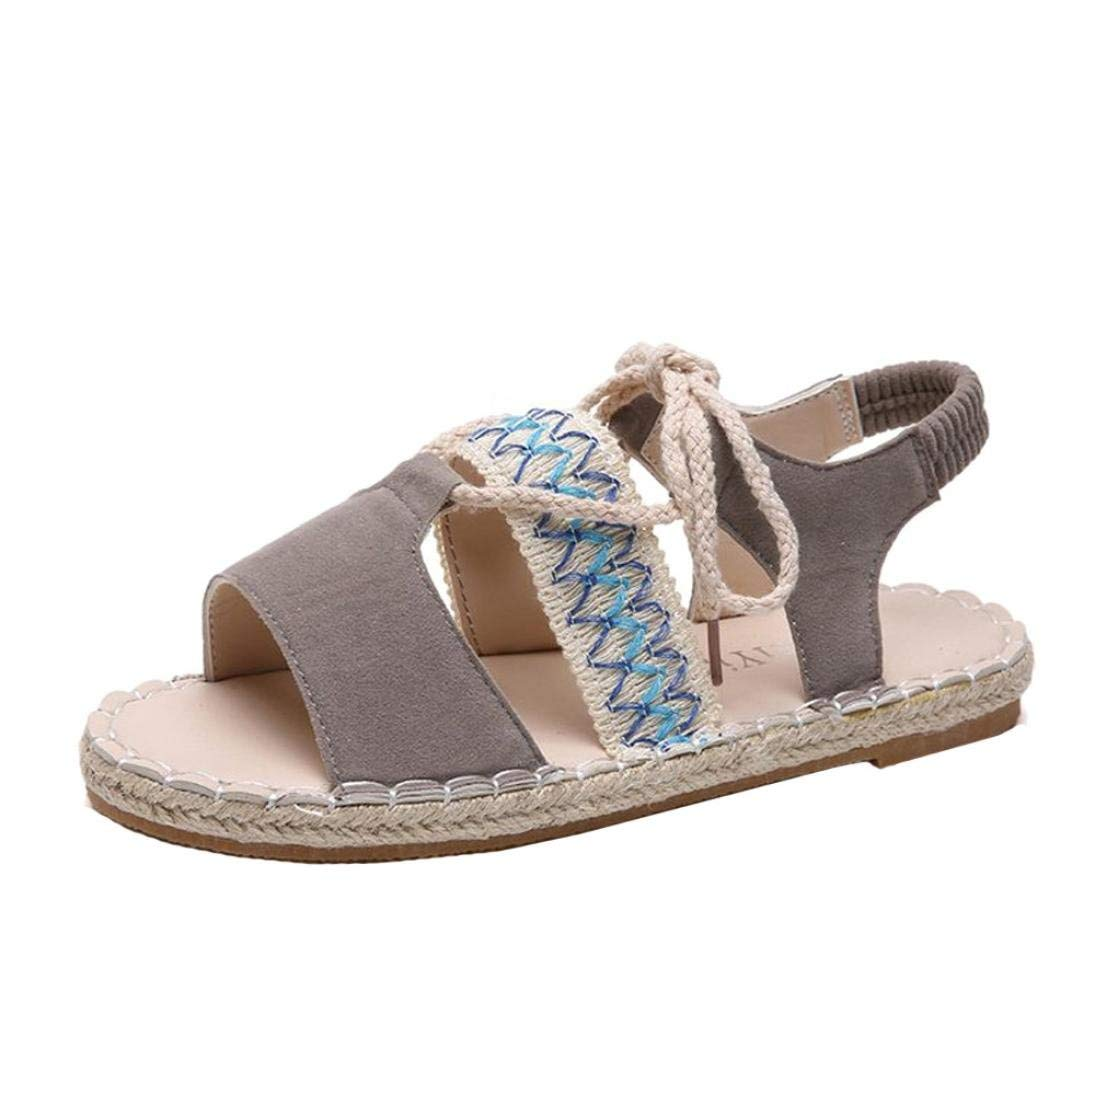 Sunshinehomely Fashion Women Girls Rome Sandals Bandage Ankle Strap Flat Bottom Espadrilles Sandals